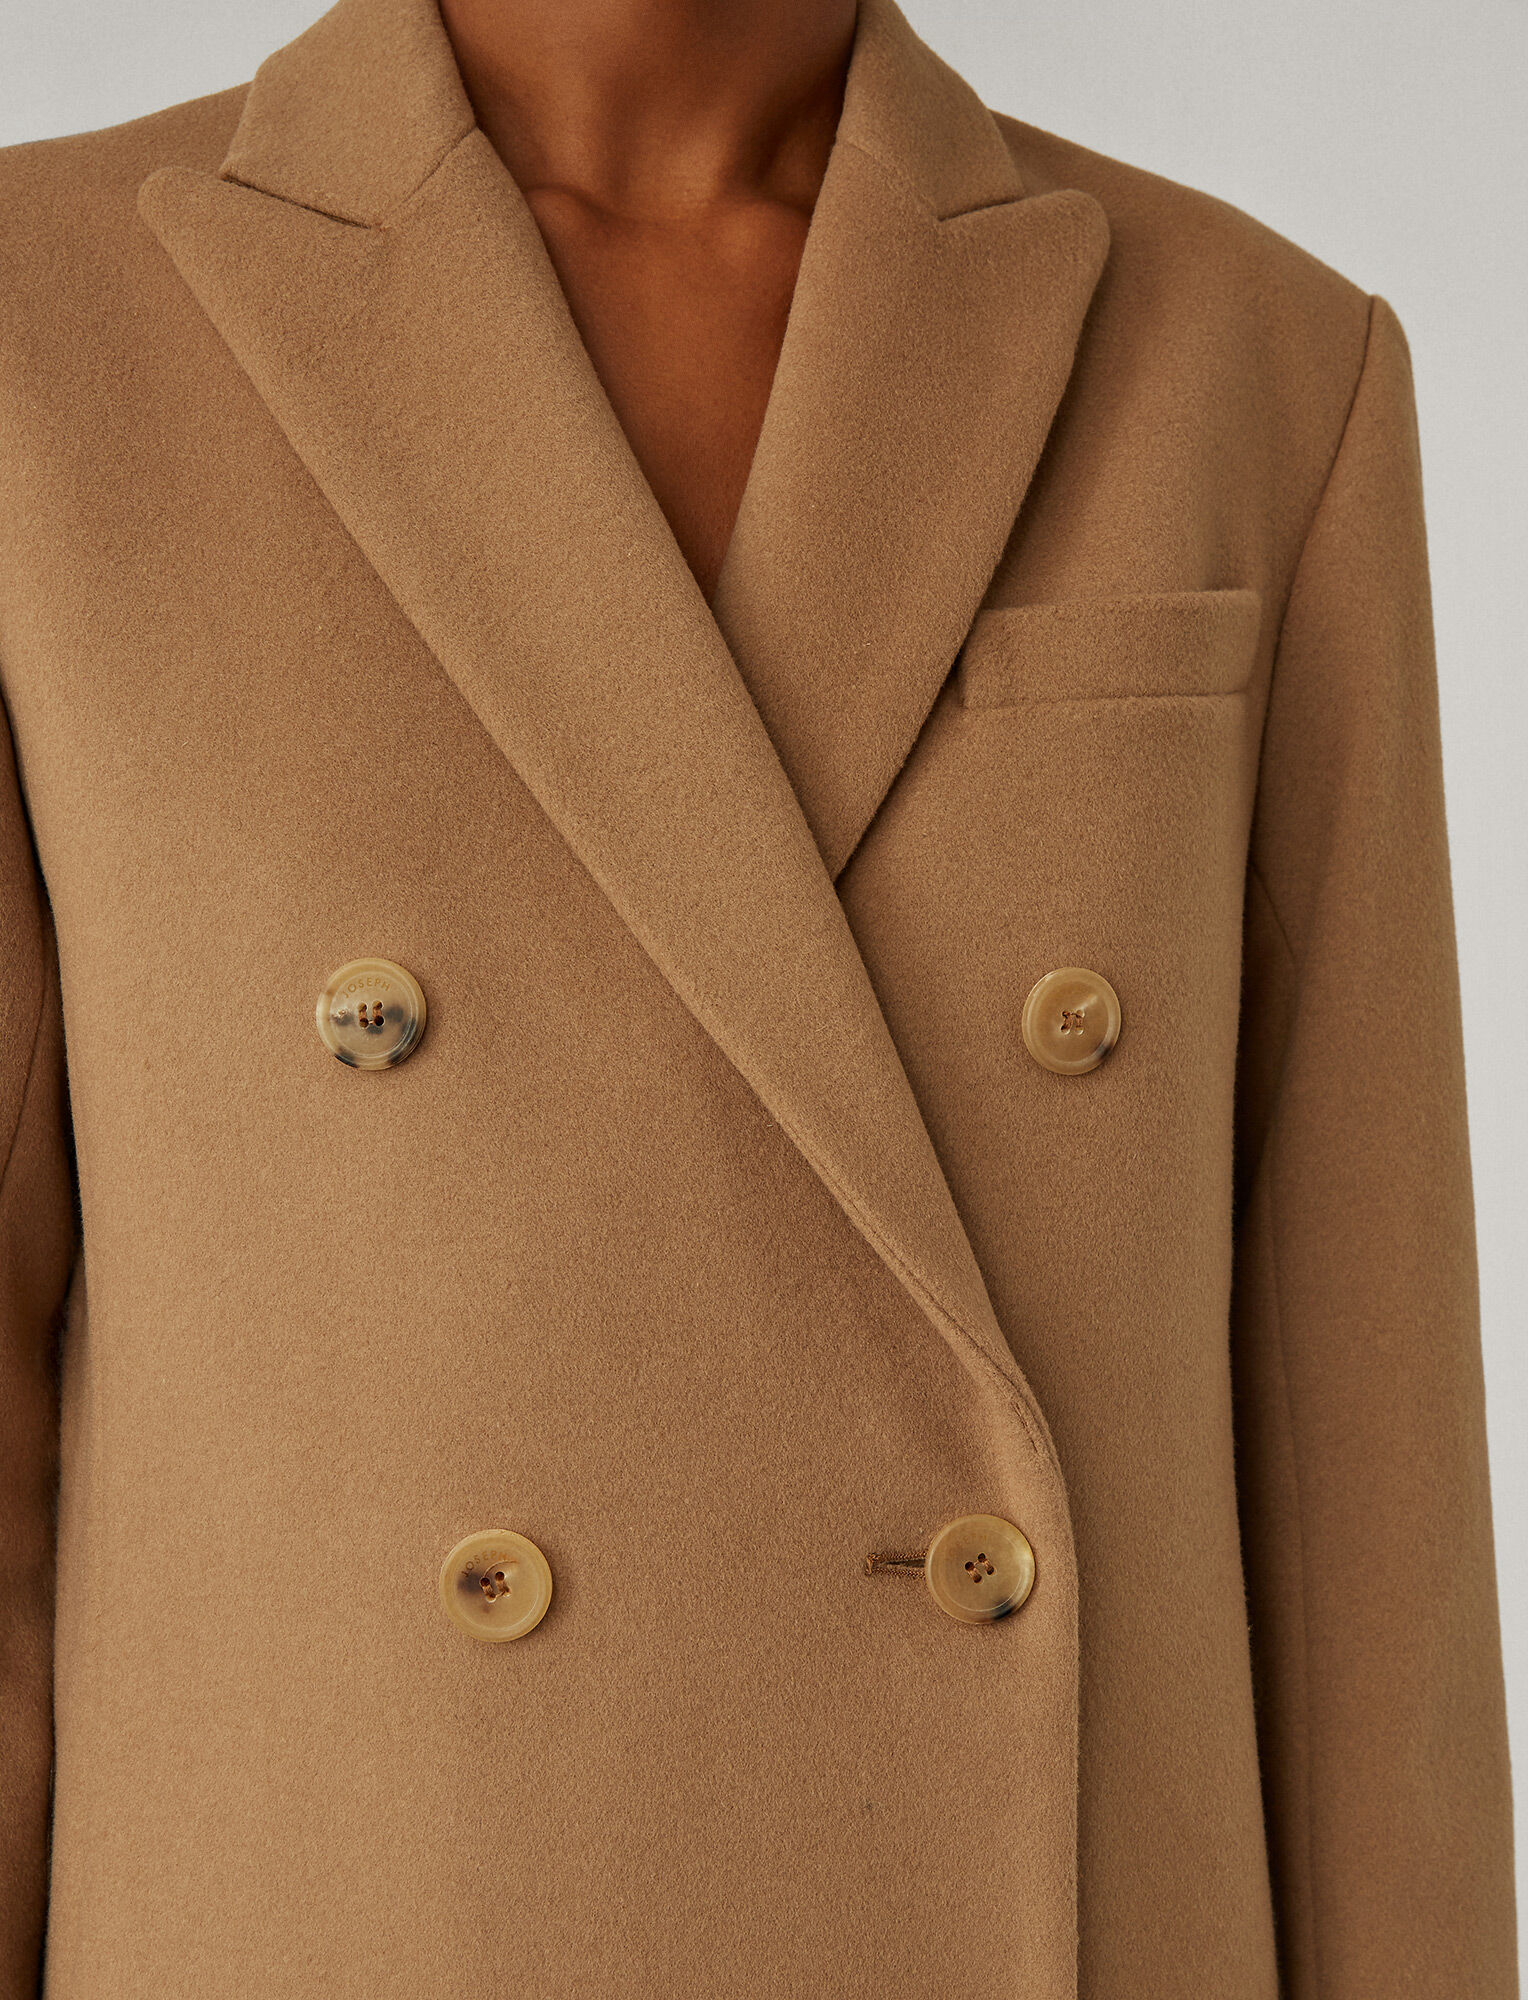 Joseph, Cam Wool Coating Coat, in Saddle